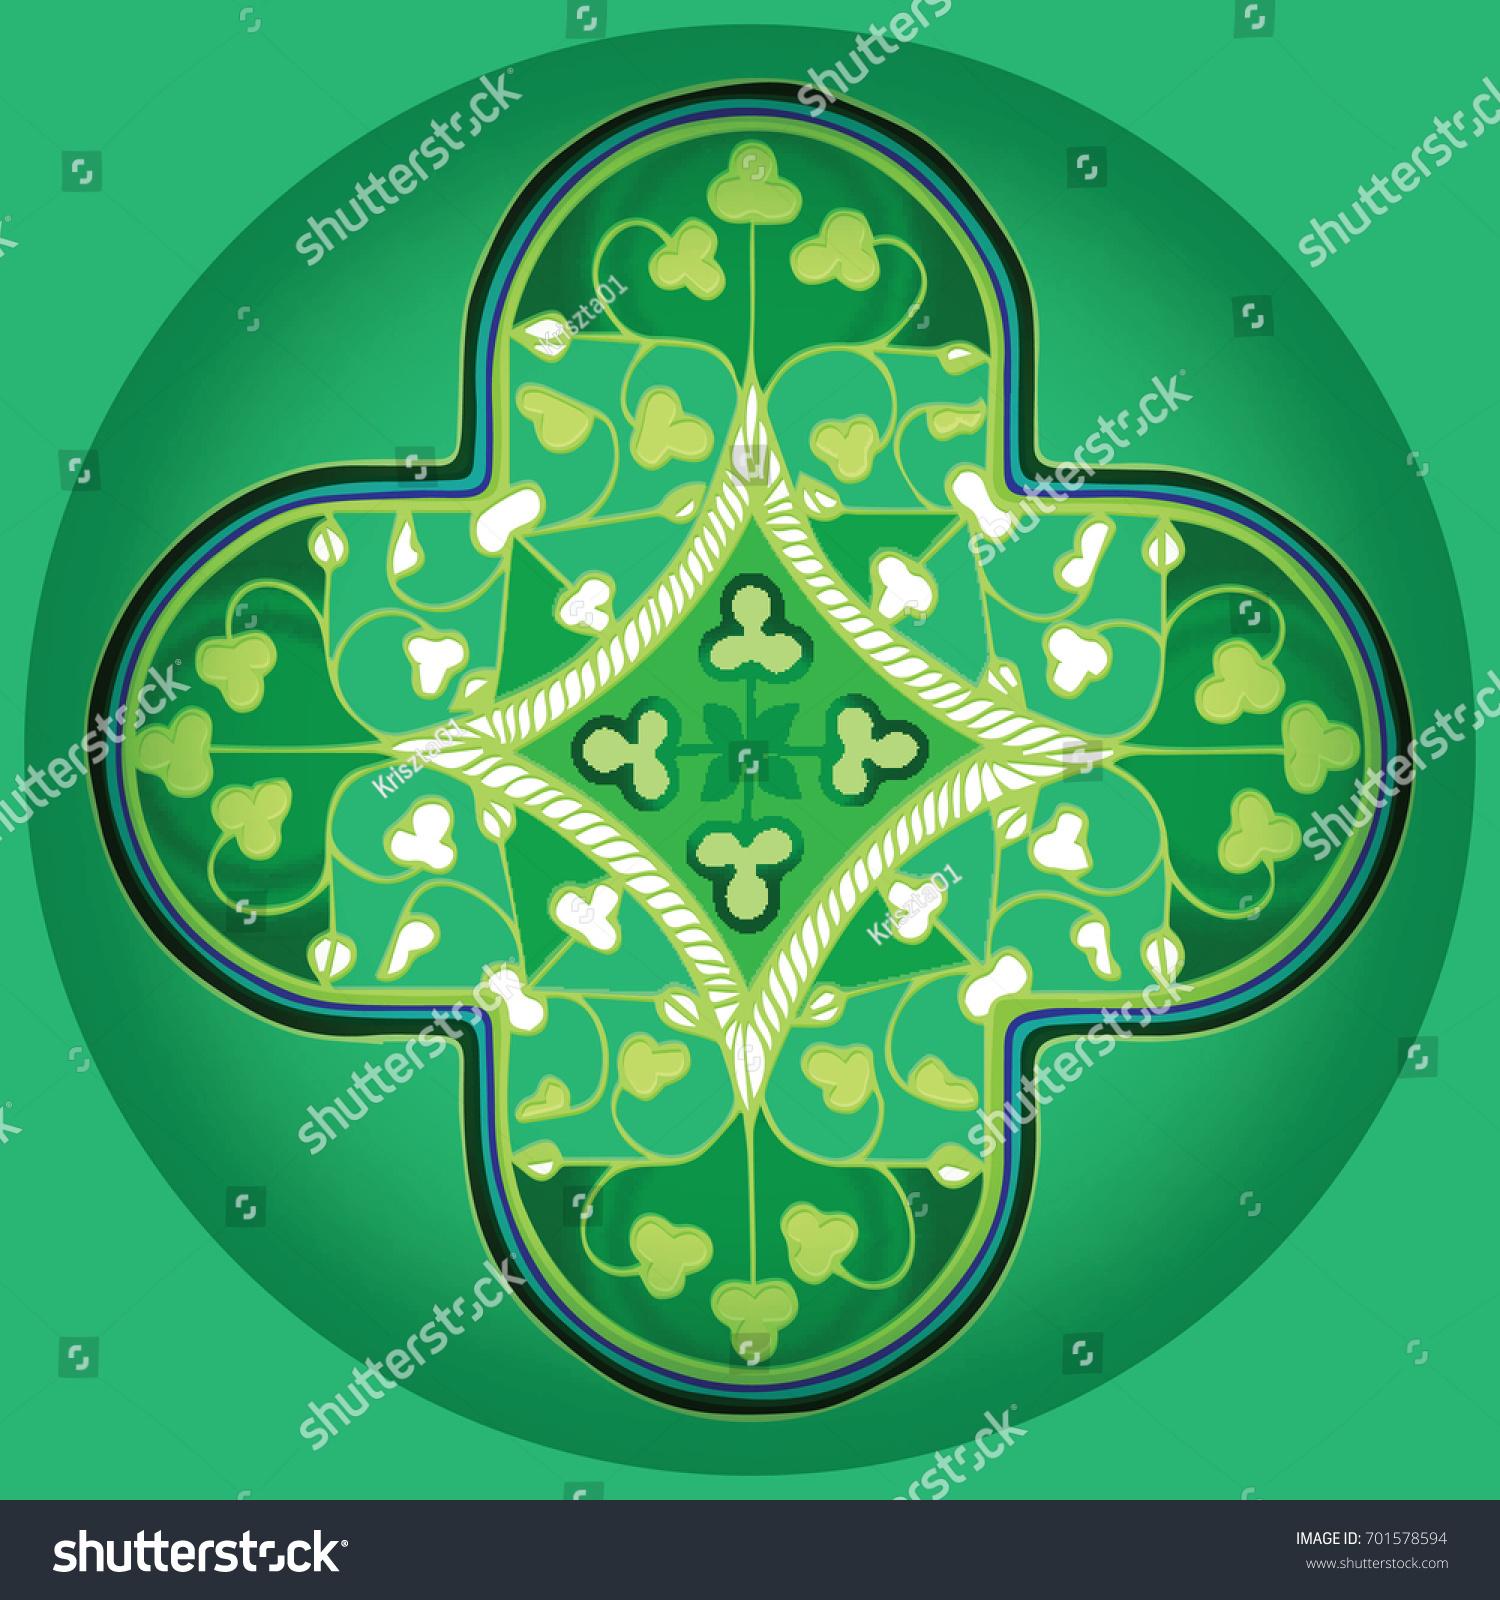 Health Mandala Green Balanced Activity Relaxation Stock Vector